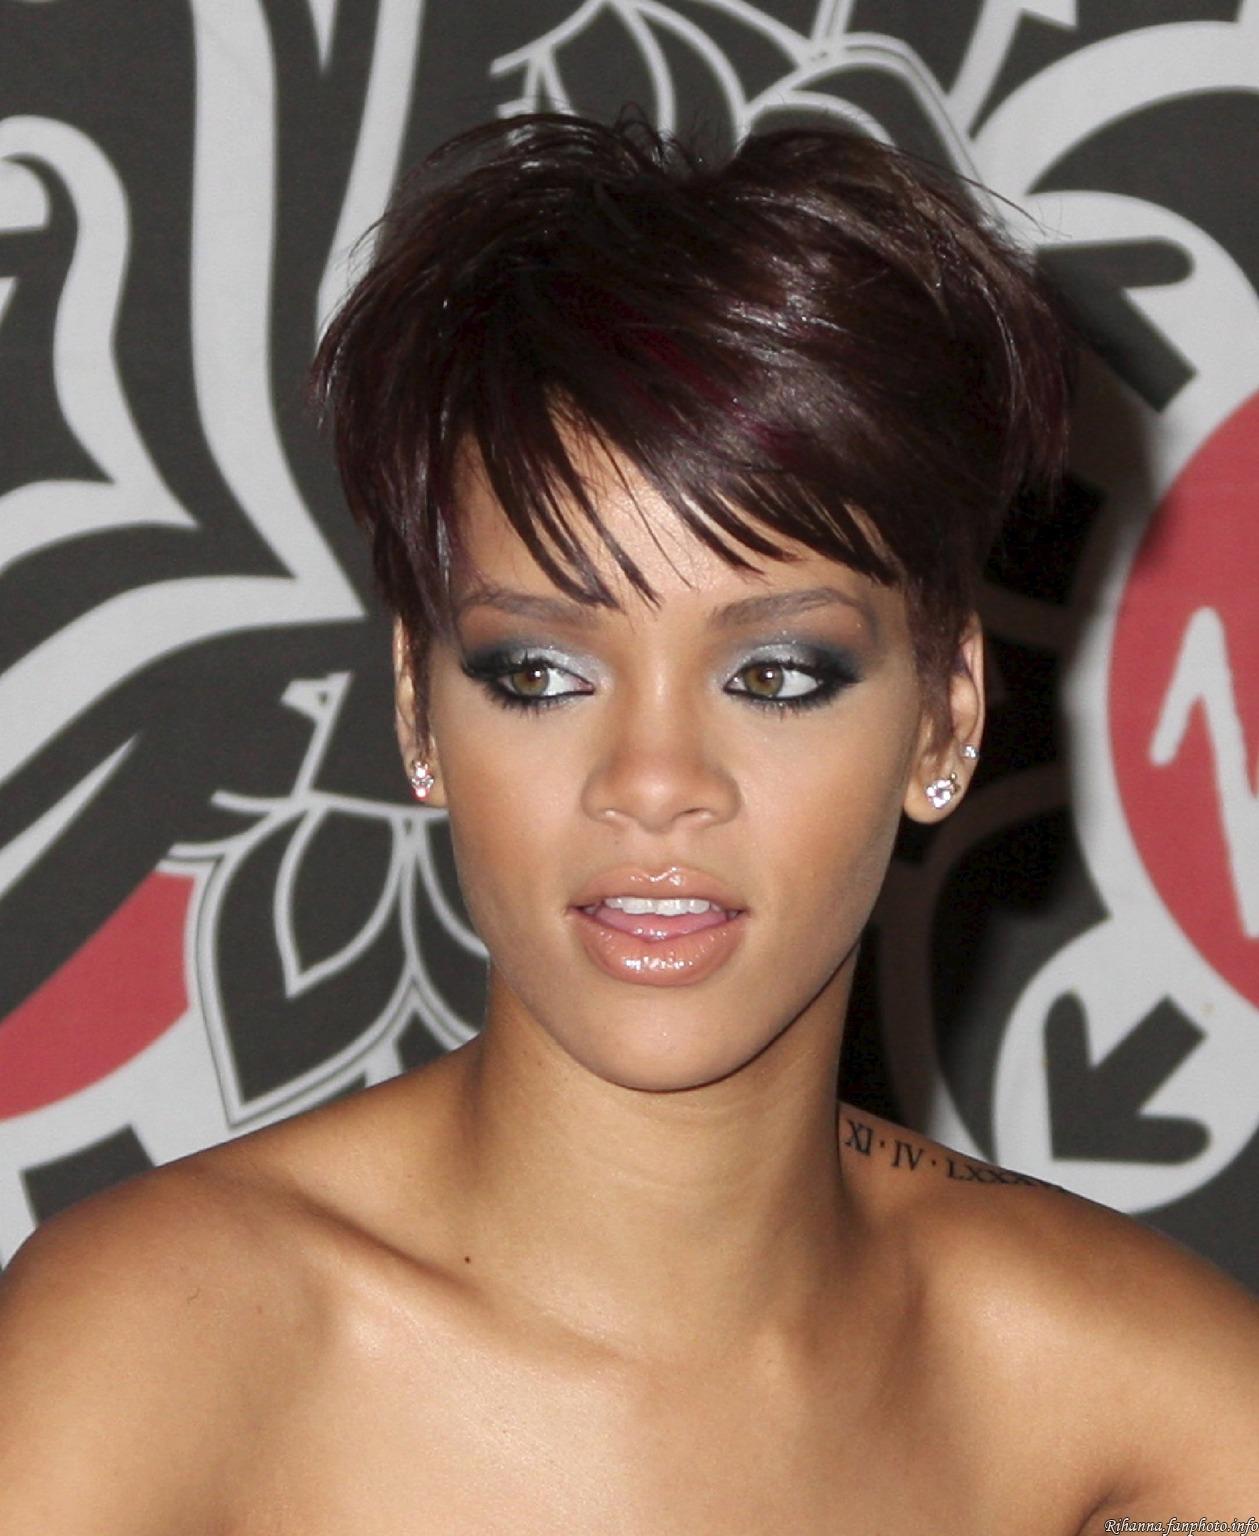 http://3.bp.blogspot.com/_v8Zg3RjUumY/S7vUeKo1w7I/AAAAAAAACuw/UGKAHKXC0EI/s1600/Rihanna_signs_copies_of_her_new_CD_at_Virgin_Megastore_in_NYC_19_06_2008_001.jpg